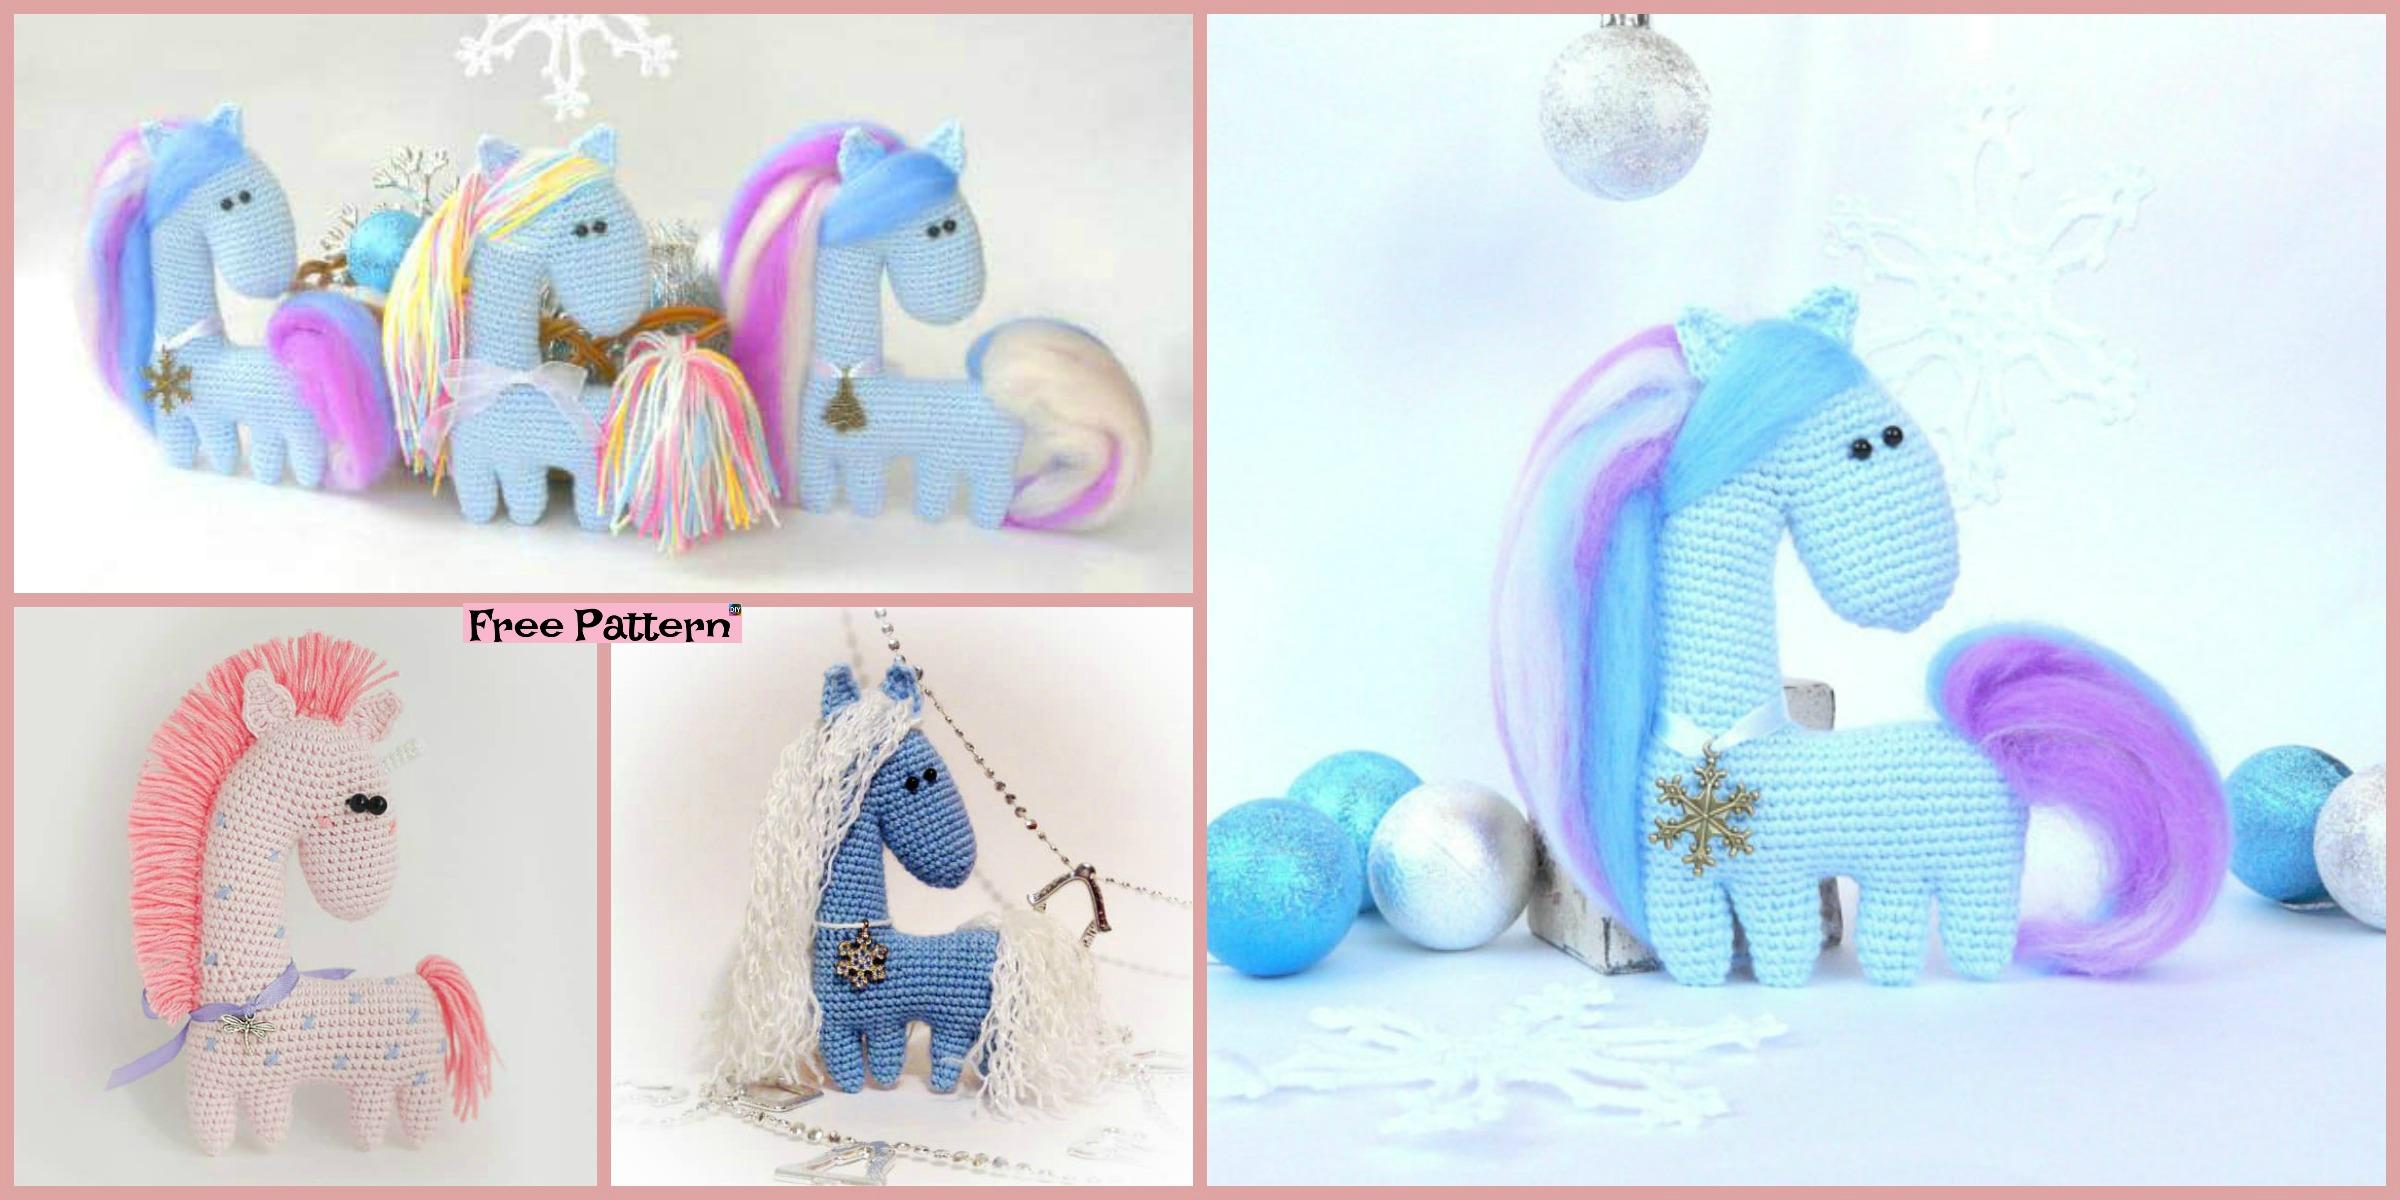 Emmie Eenhoorn - Free Pattern (Crochet For Children) | Crochet ... | 1200x2400